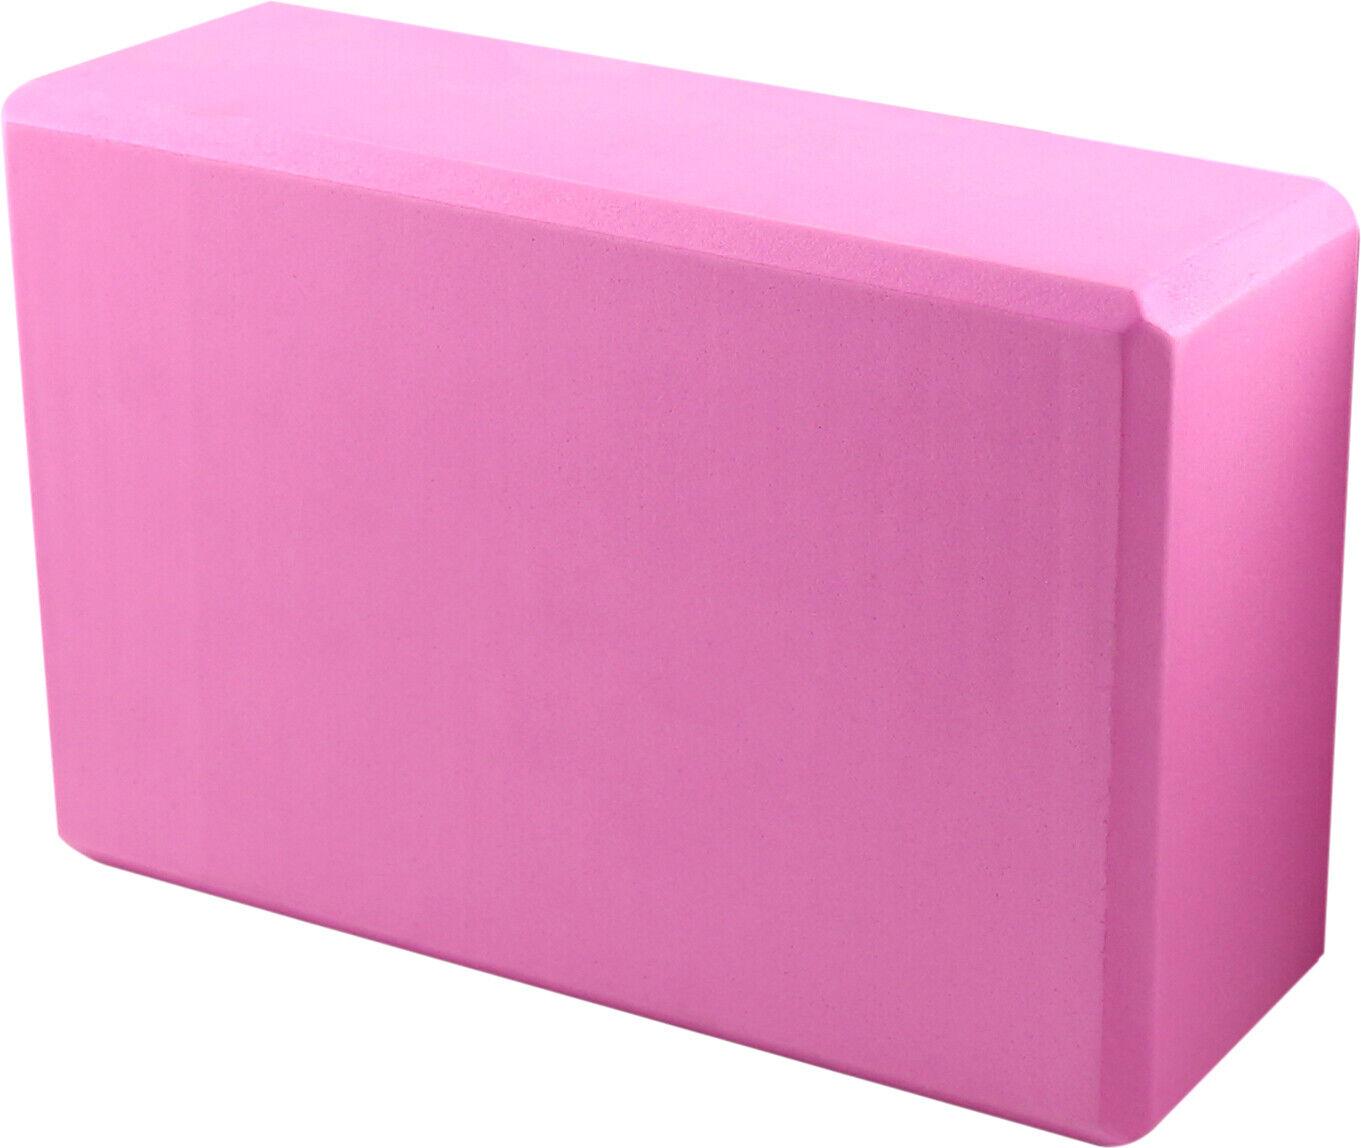 VIPELE Yoga Block  High Density EVA Foam Block. Support and Deepen Poses